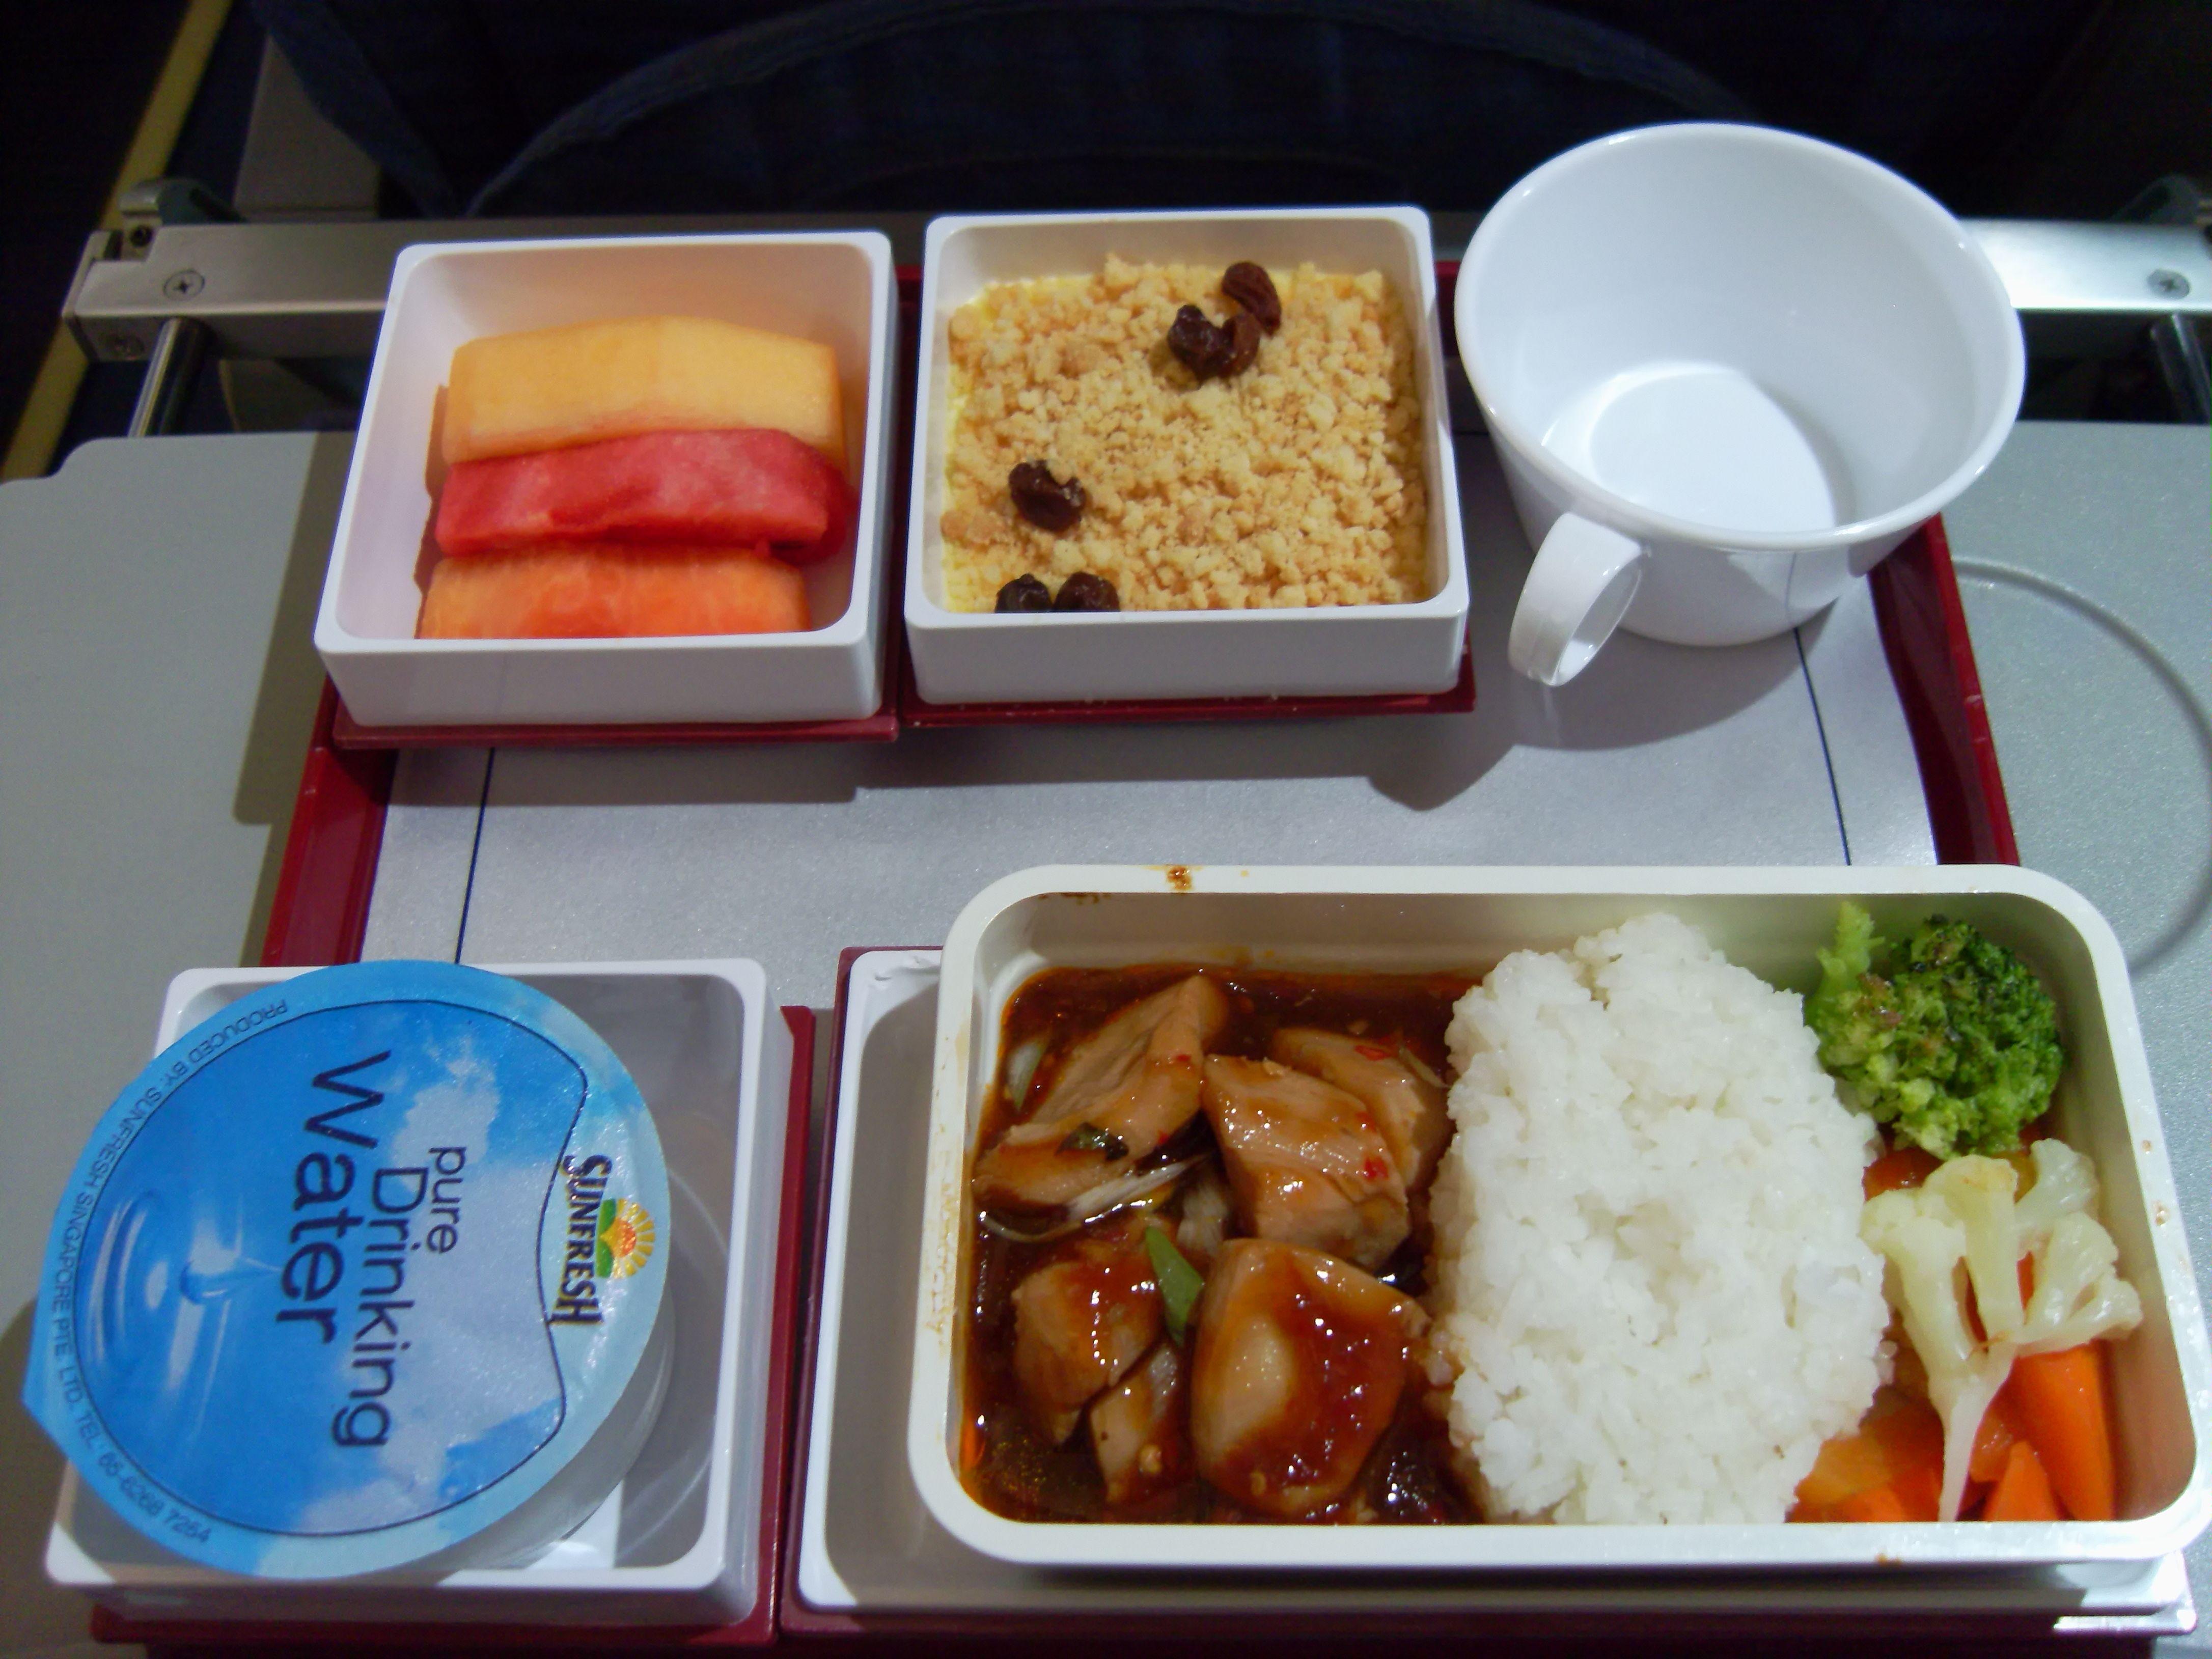 Gulf Air Food Menu